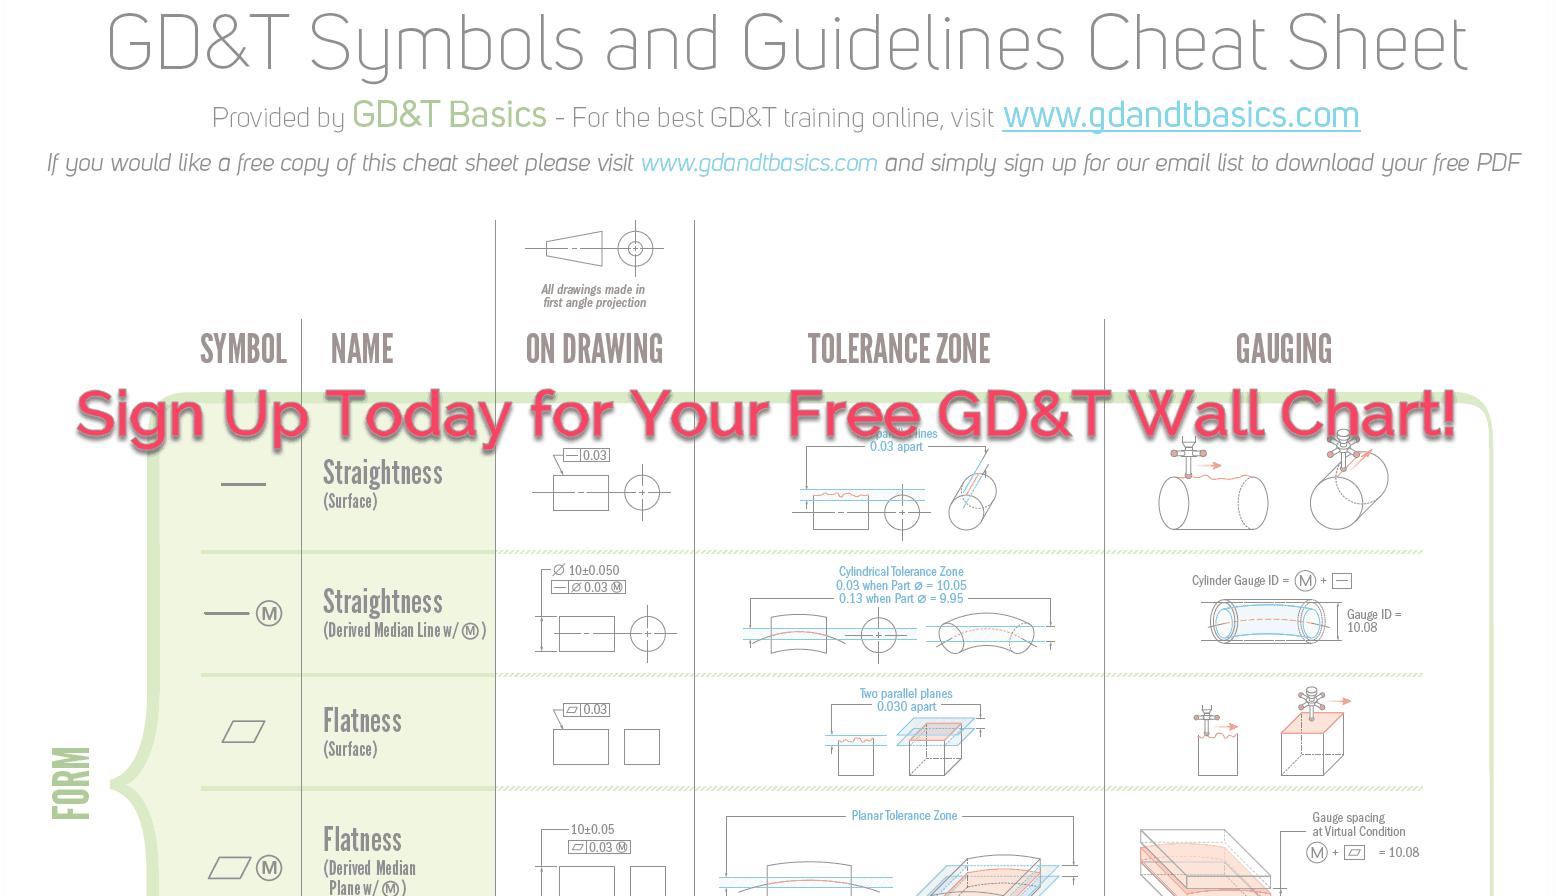 Gdt symbols chart the best gdt pdf online gdt basics gdt wall chart pdf sample buycottarizona Image collections